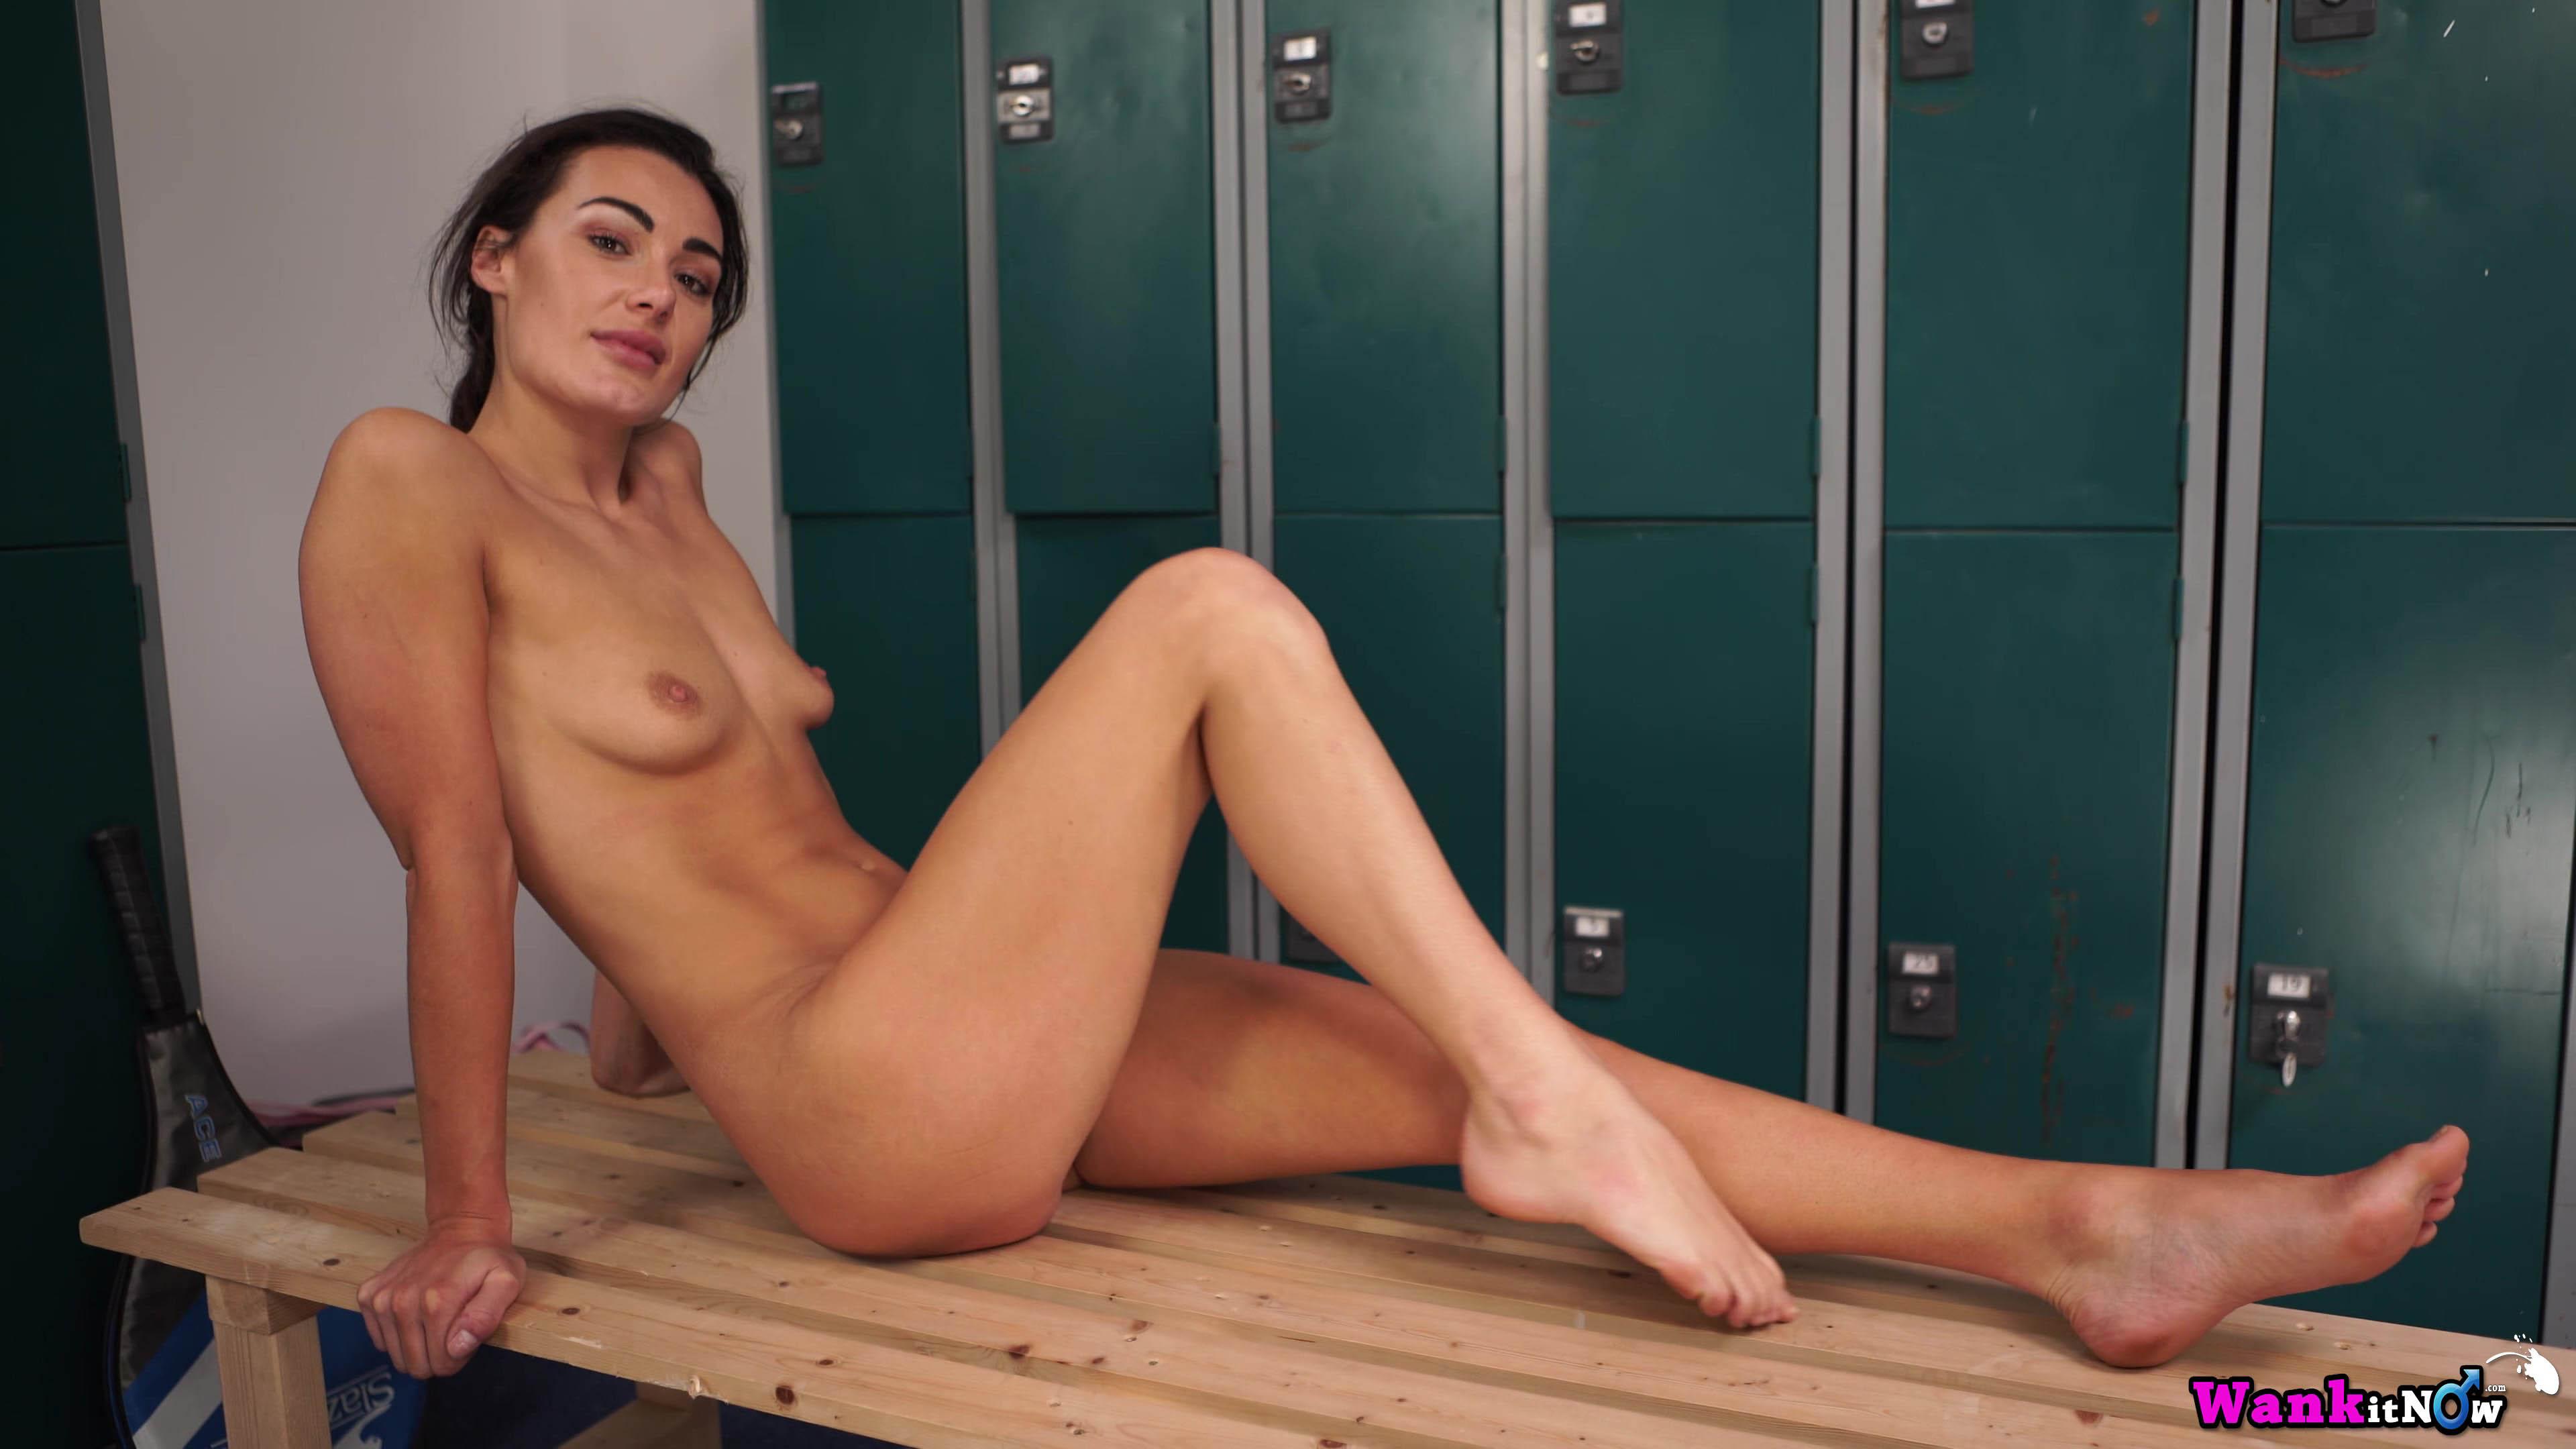 Maxine nude